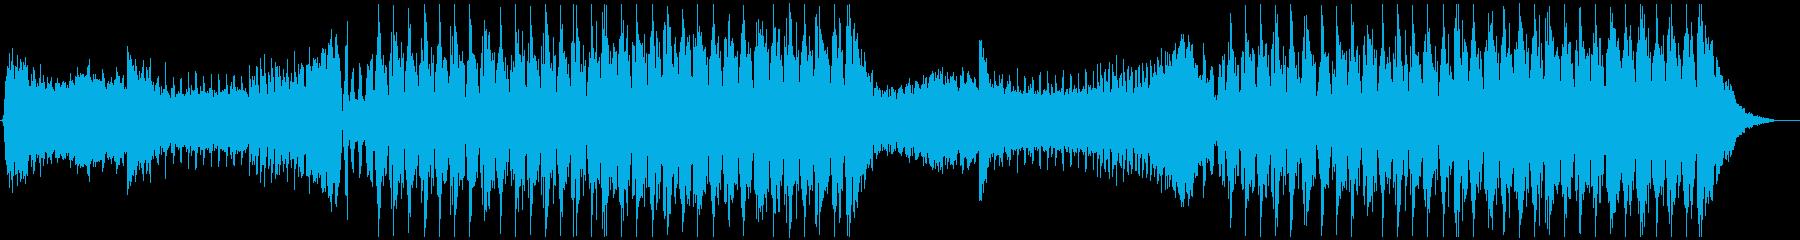 eスポーツ ダークエレクトロの再生済みの波形